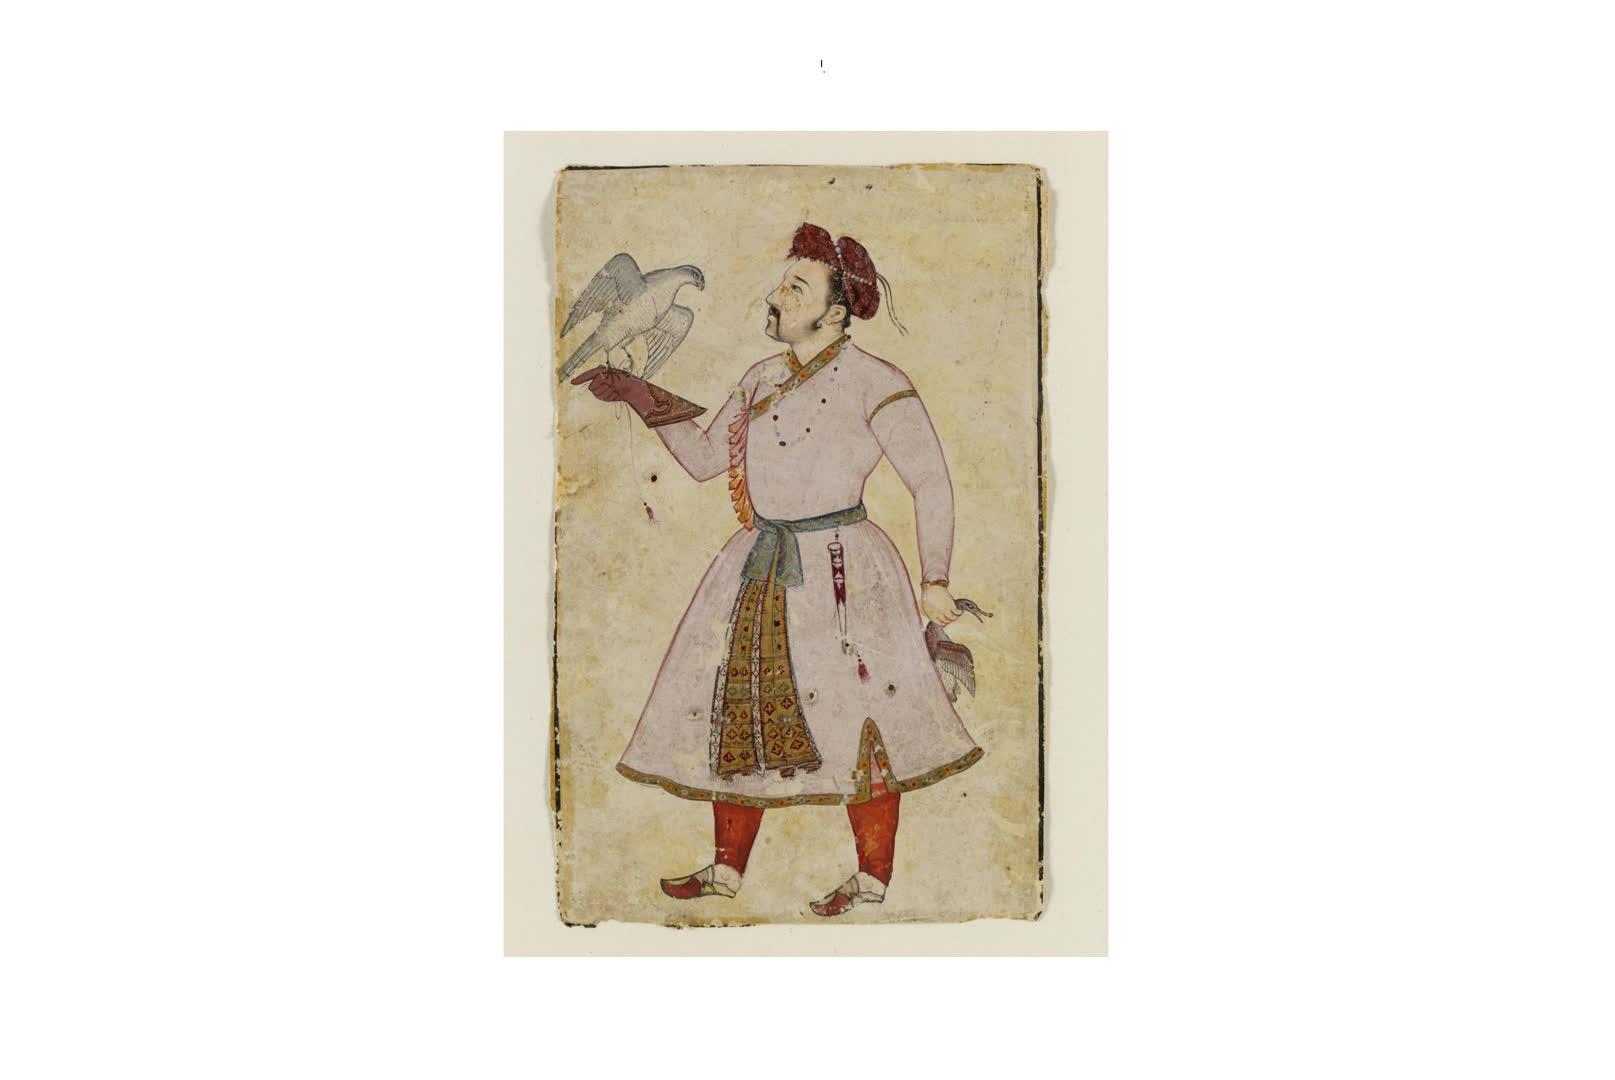 Emperor Jahangir: The Naturalist